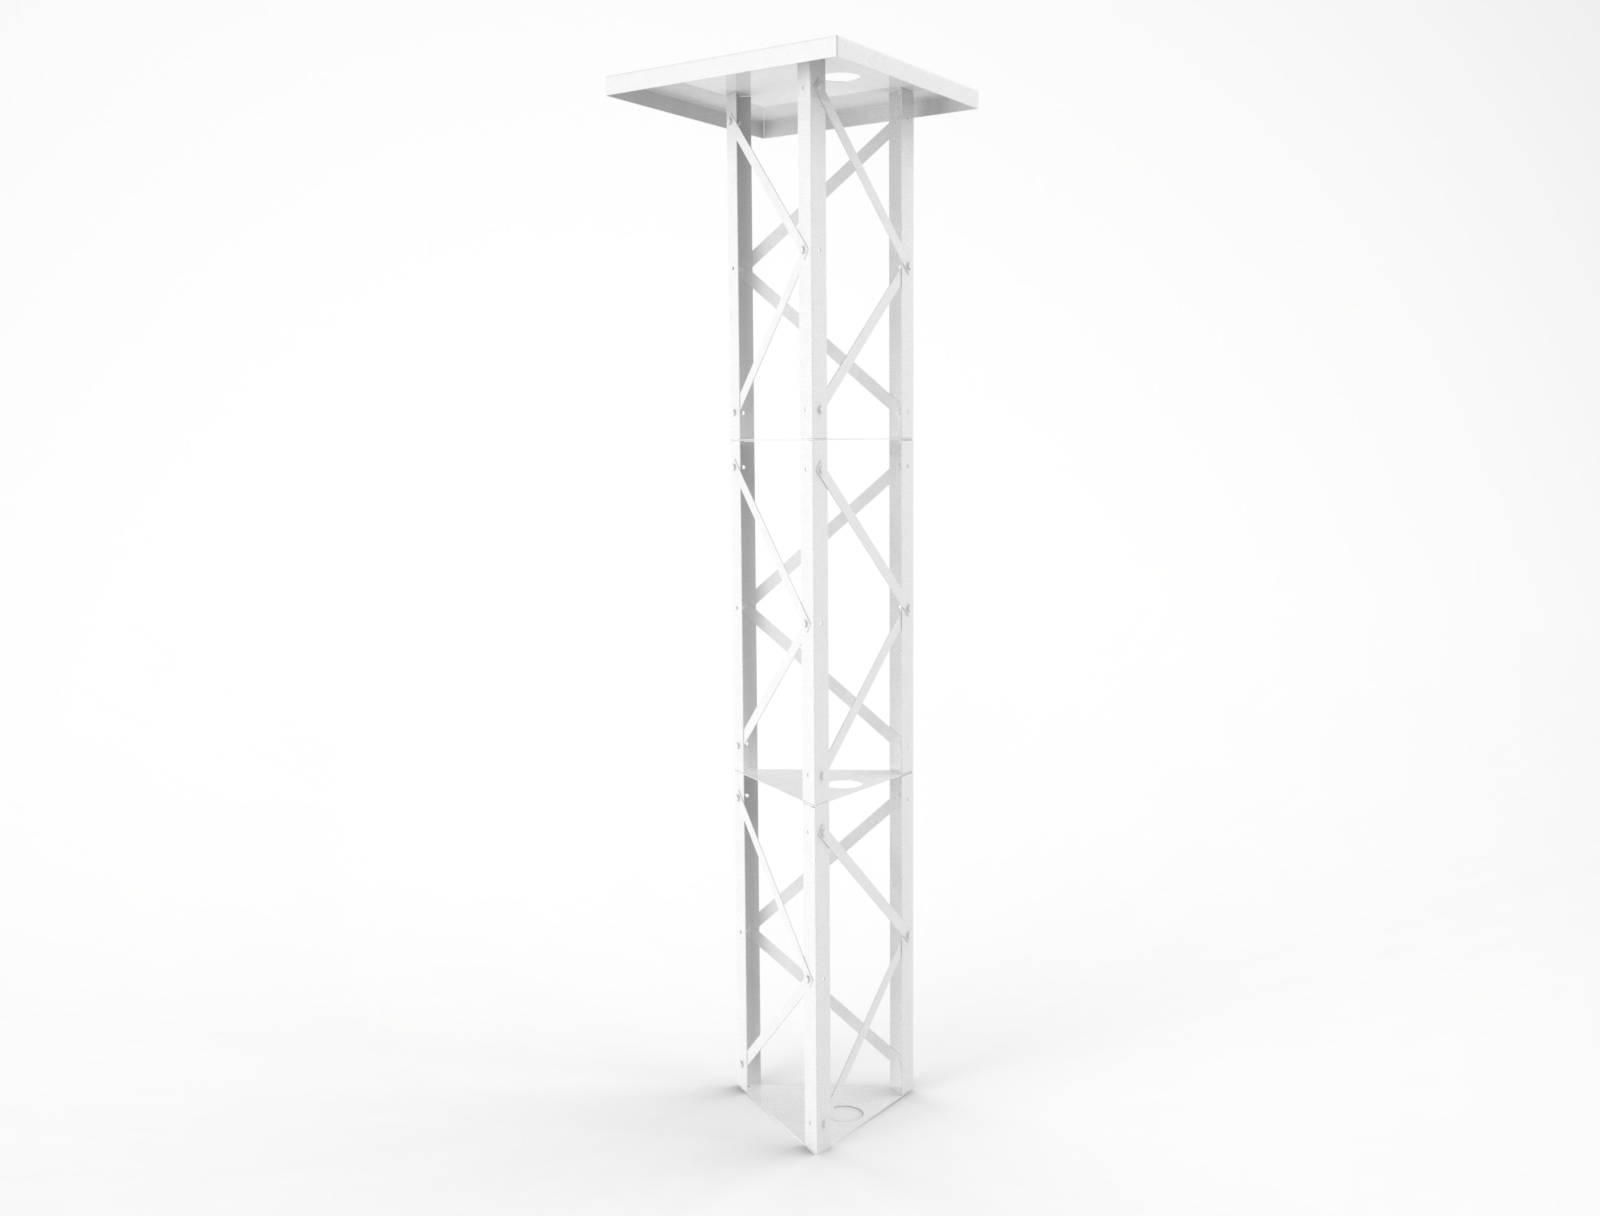 Pillar stand Anna oil mist eliminator